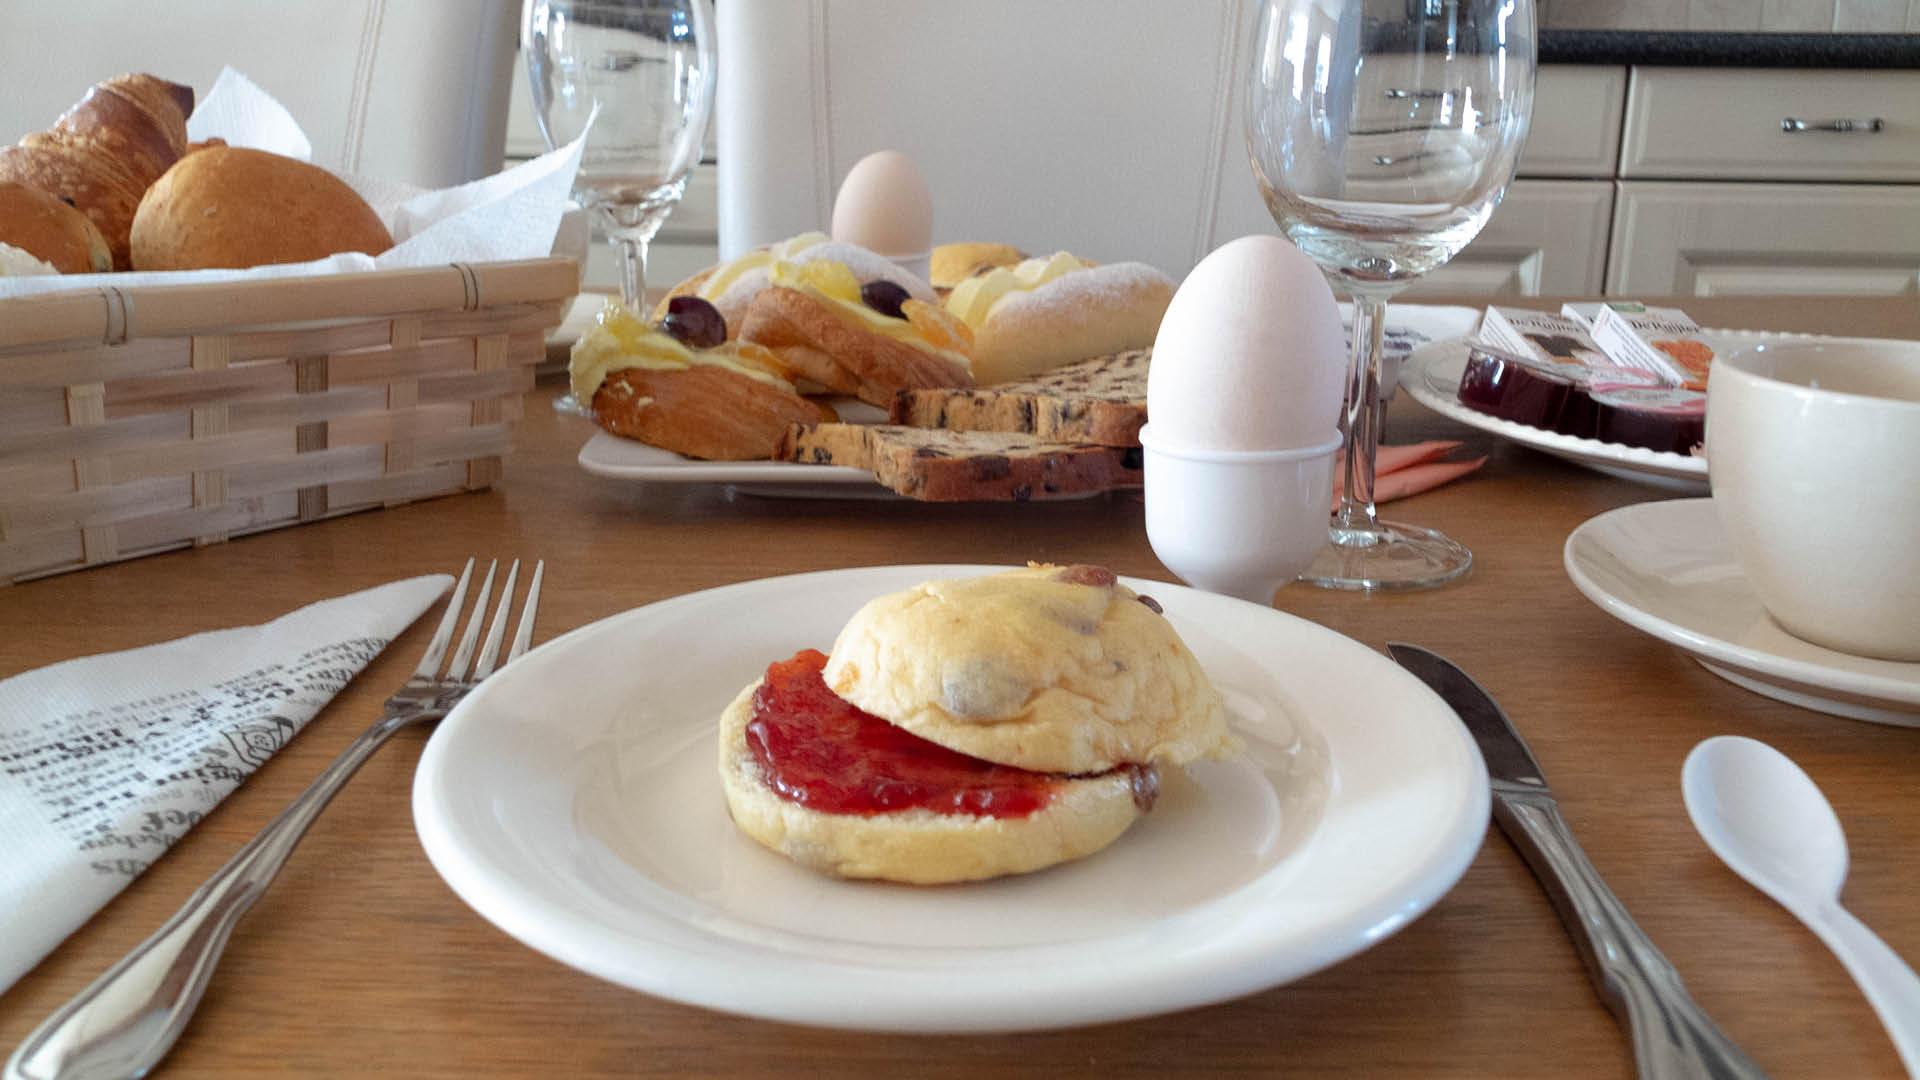 Slider ontbijtservice7